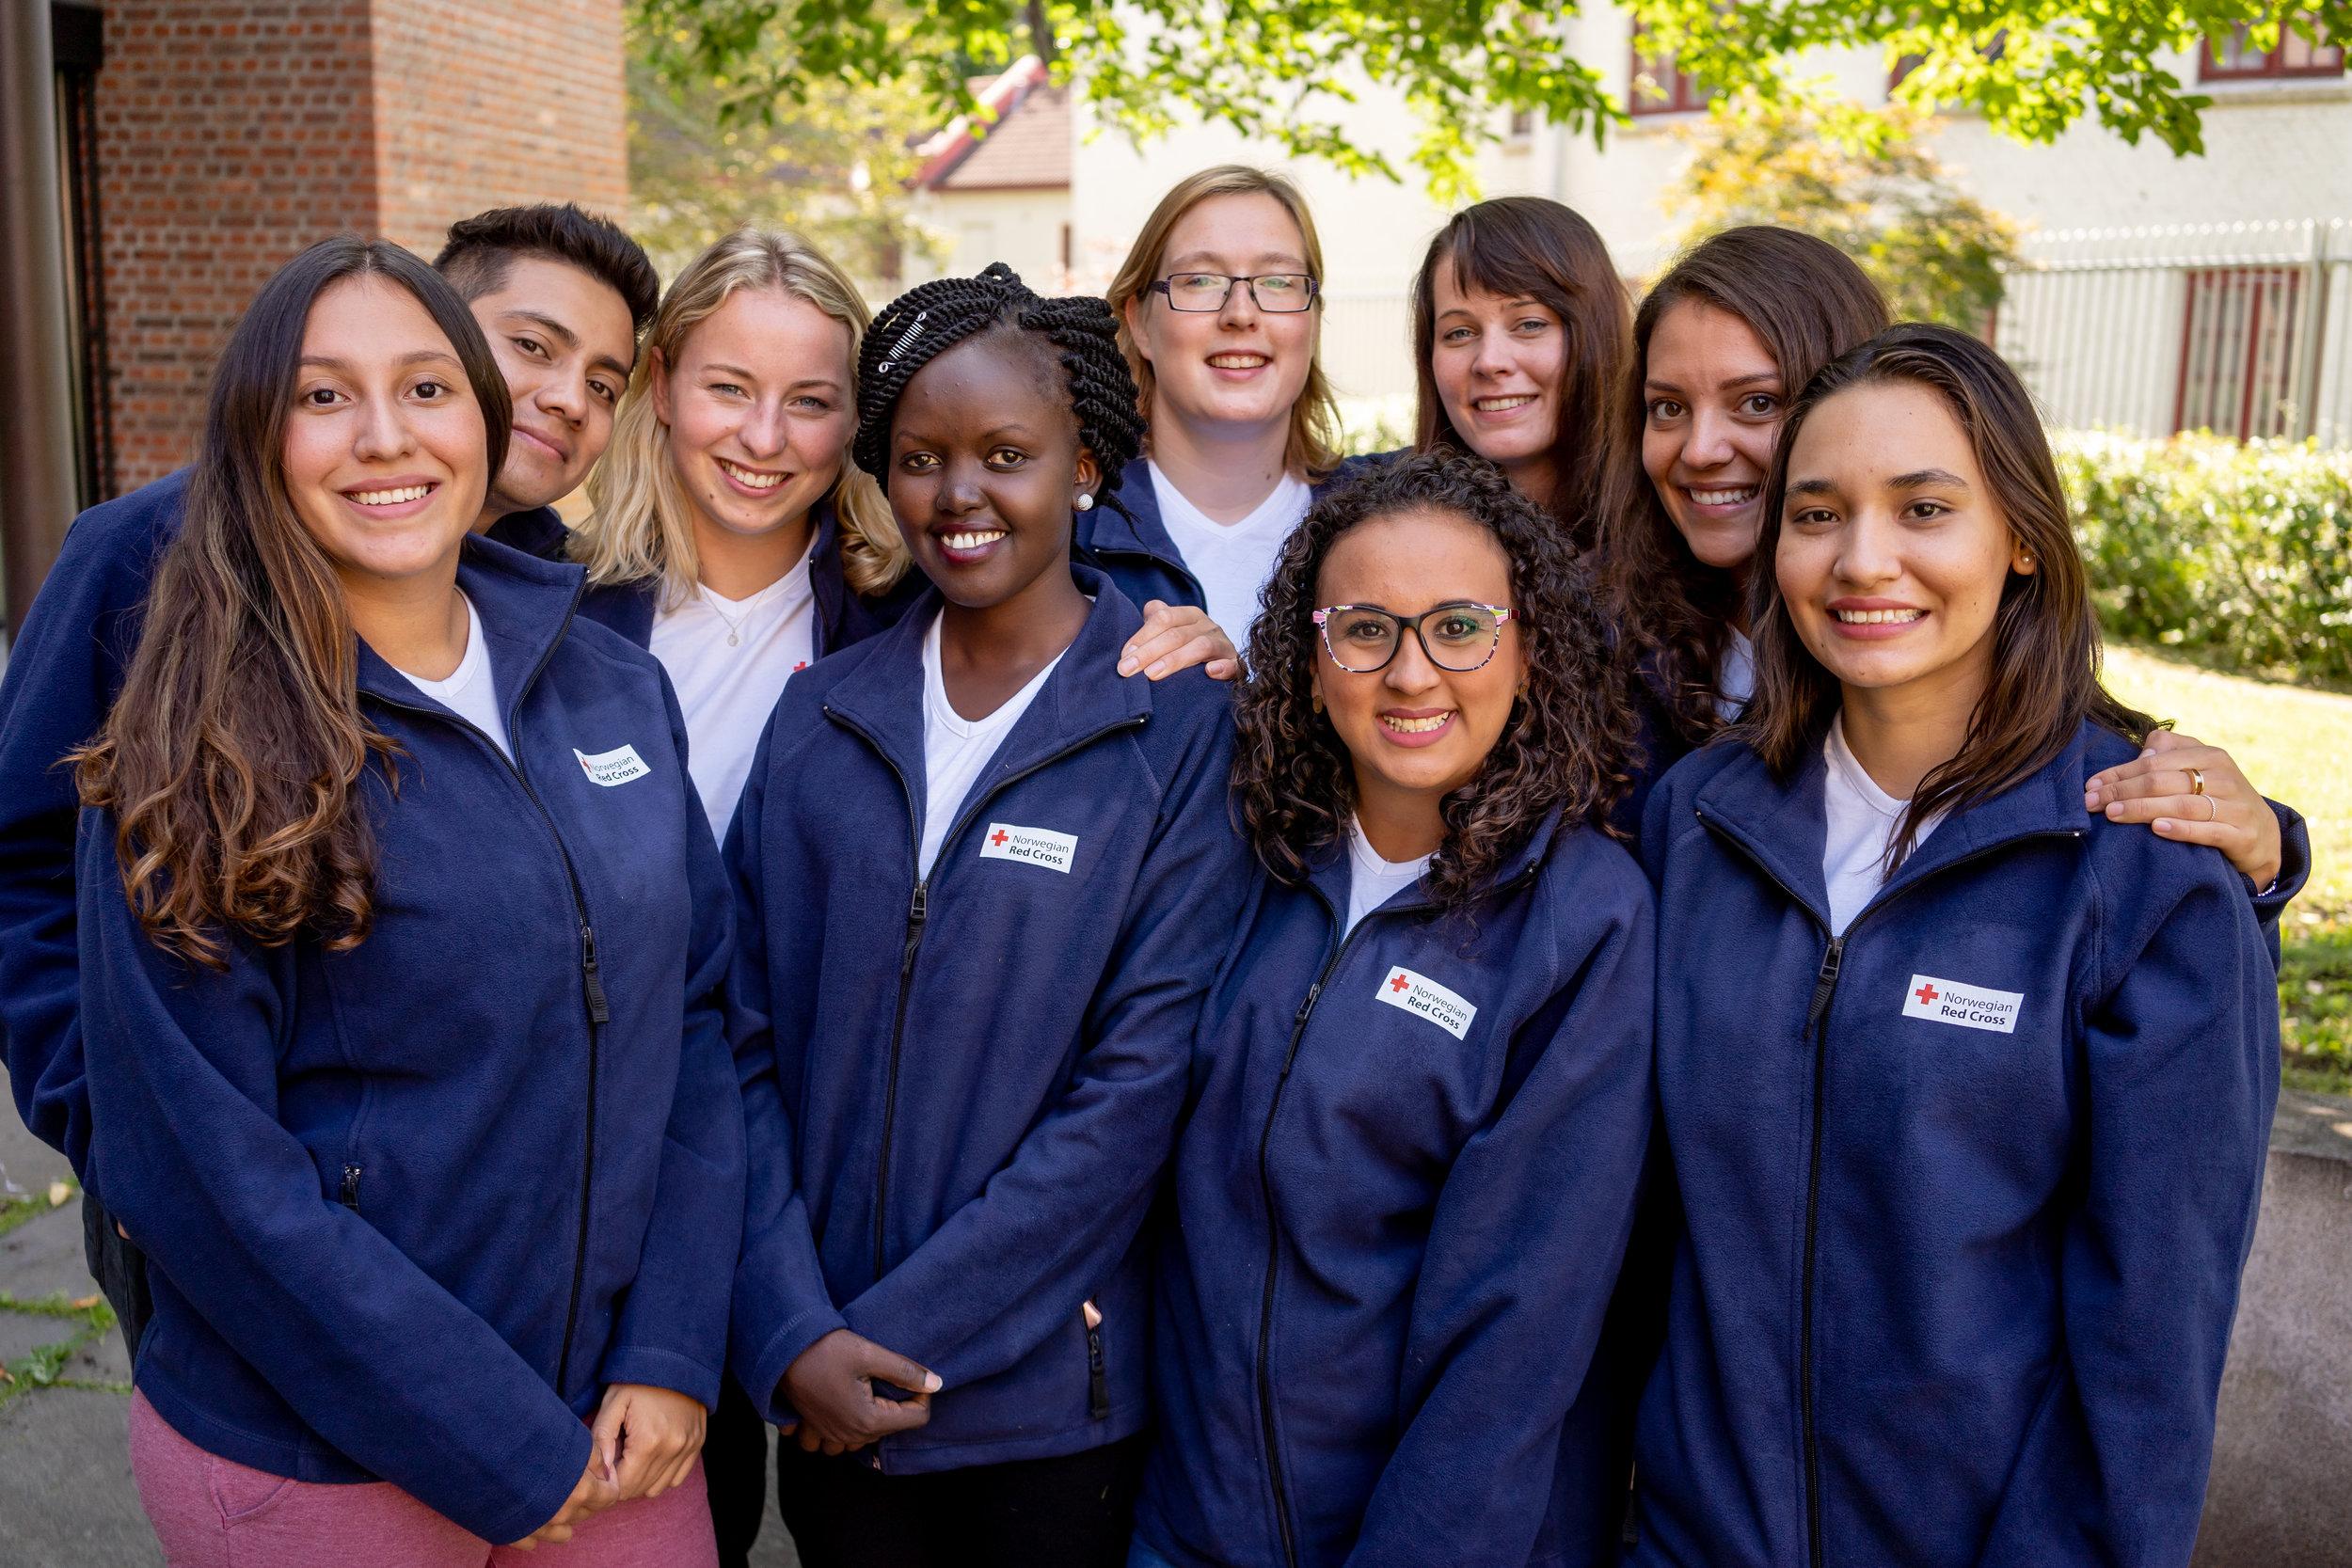 The Youth Delegates 2019 - 2020. Photo: Olav A. Saltbones